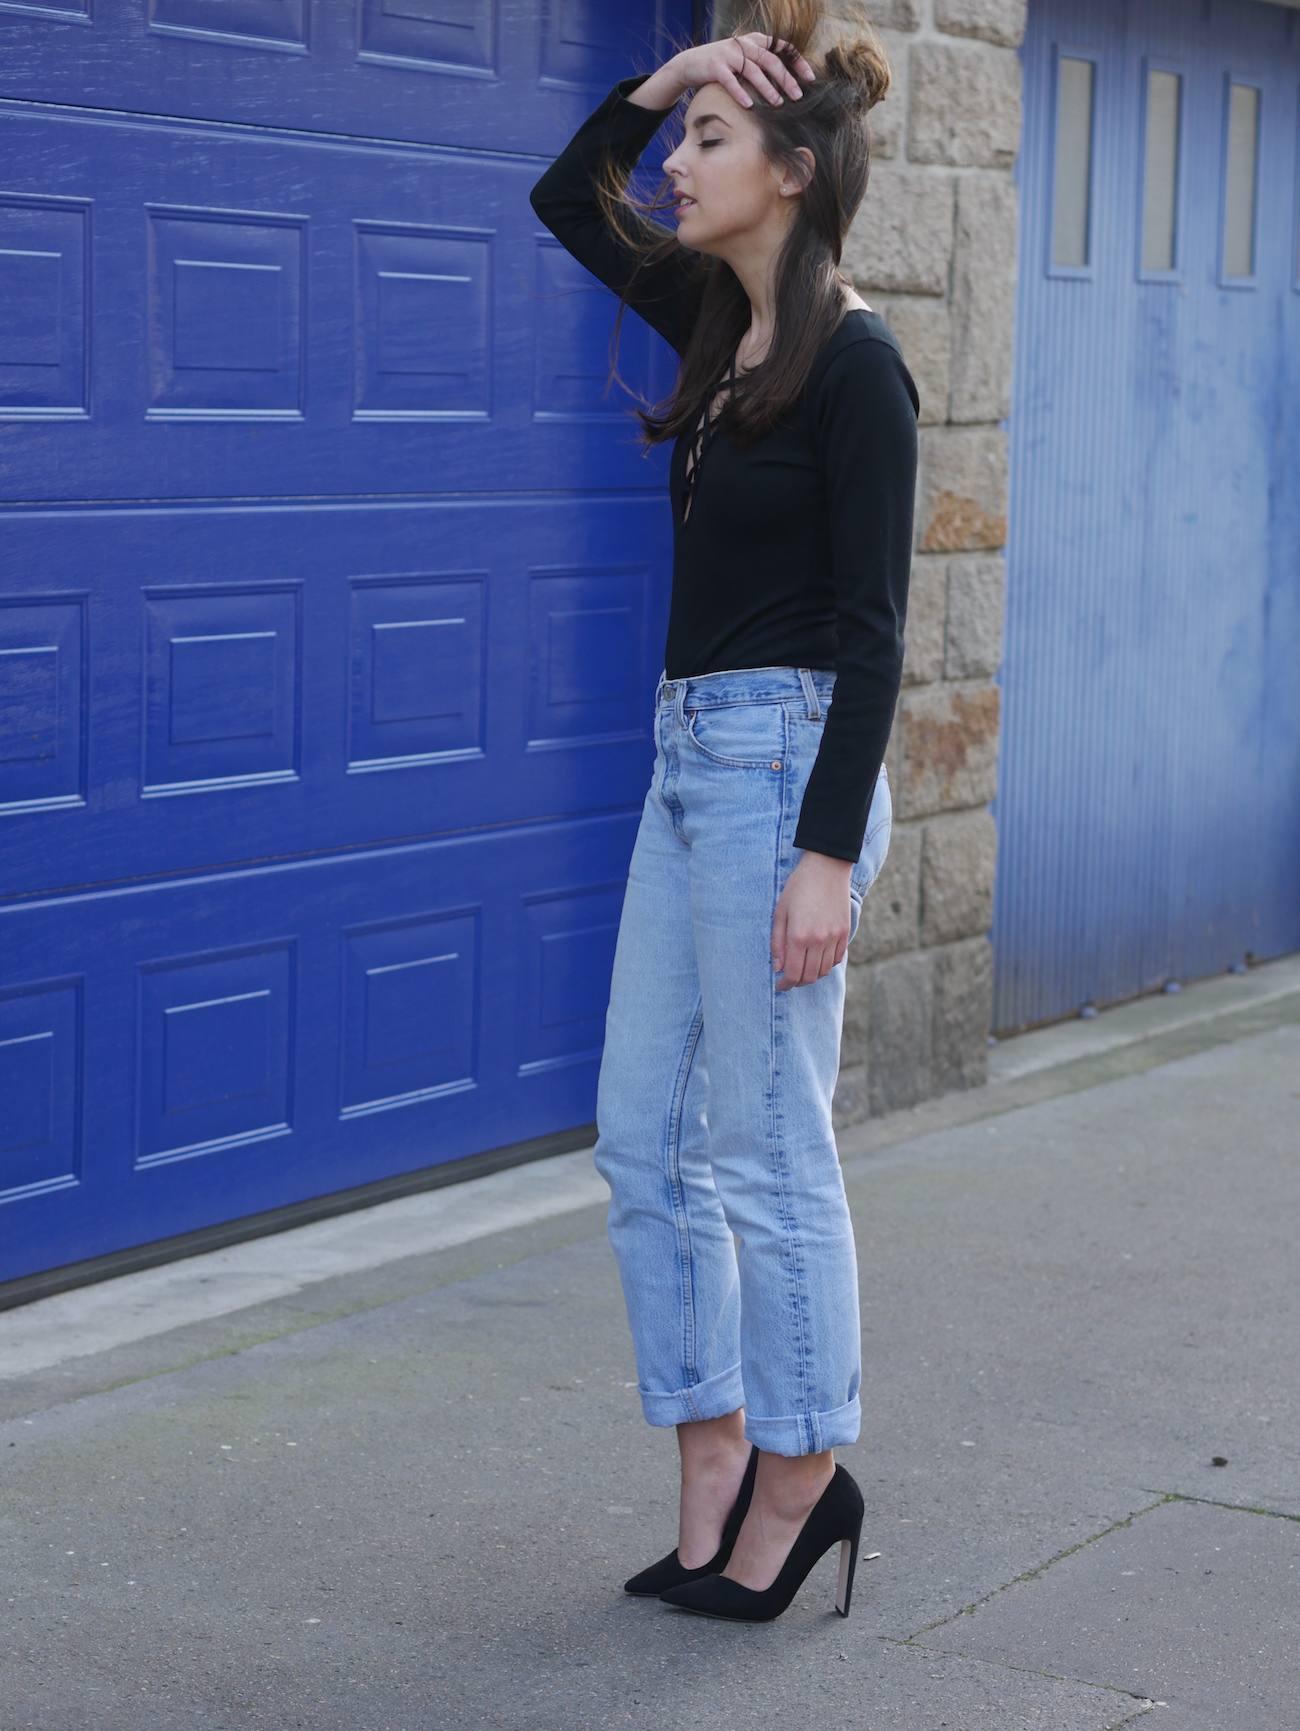 blog nantes - nolwenn c 11